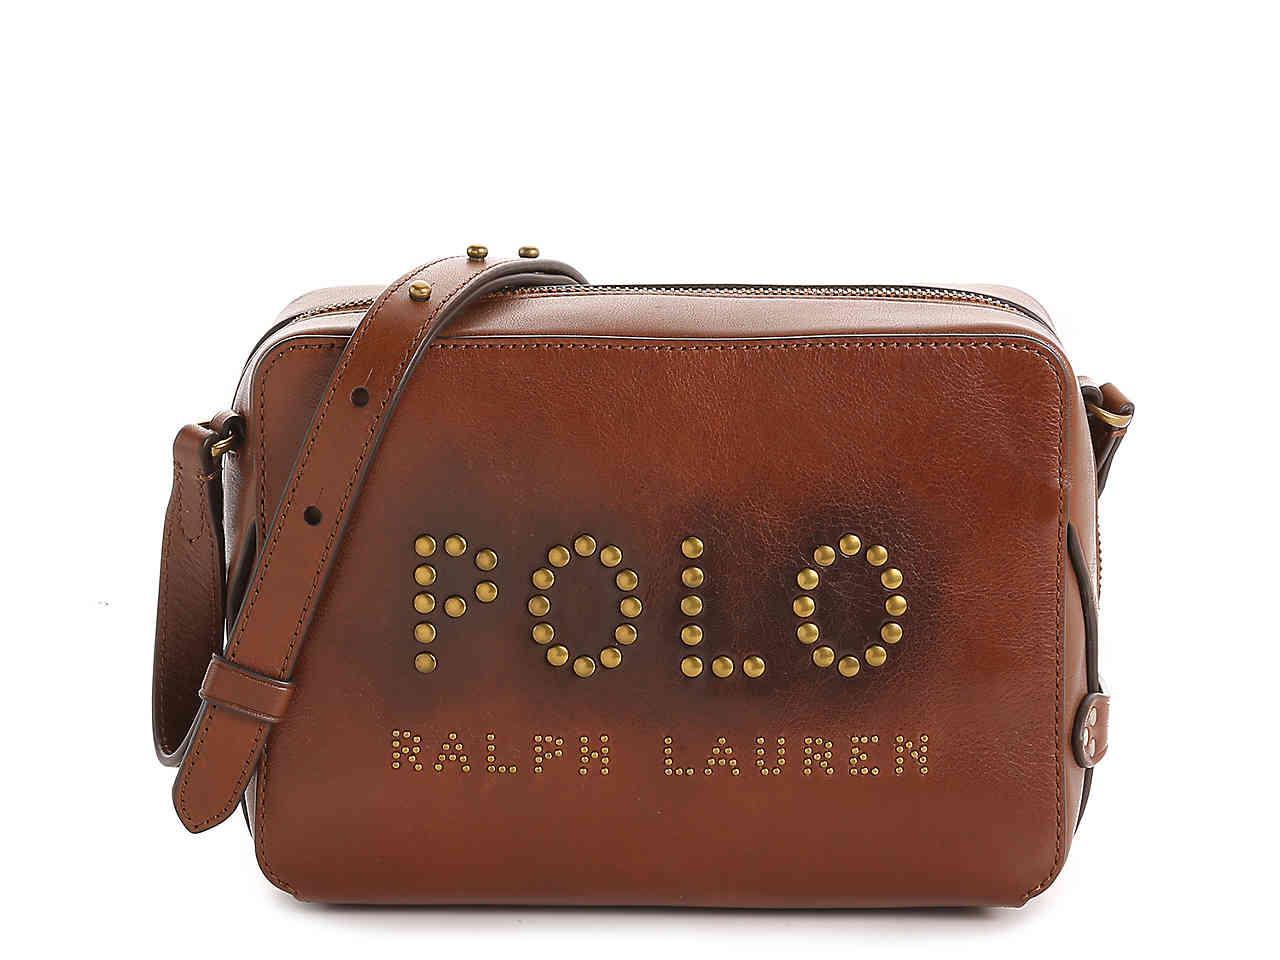 42f9fe01af Lyst - Polo Ralph Lauren Palmer Leather Crossbody Bag in Brown